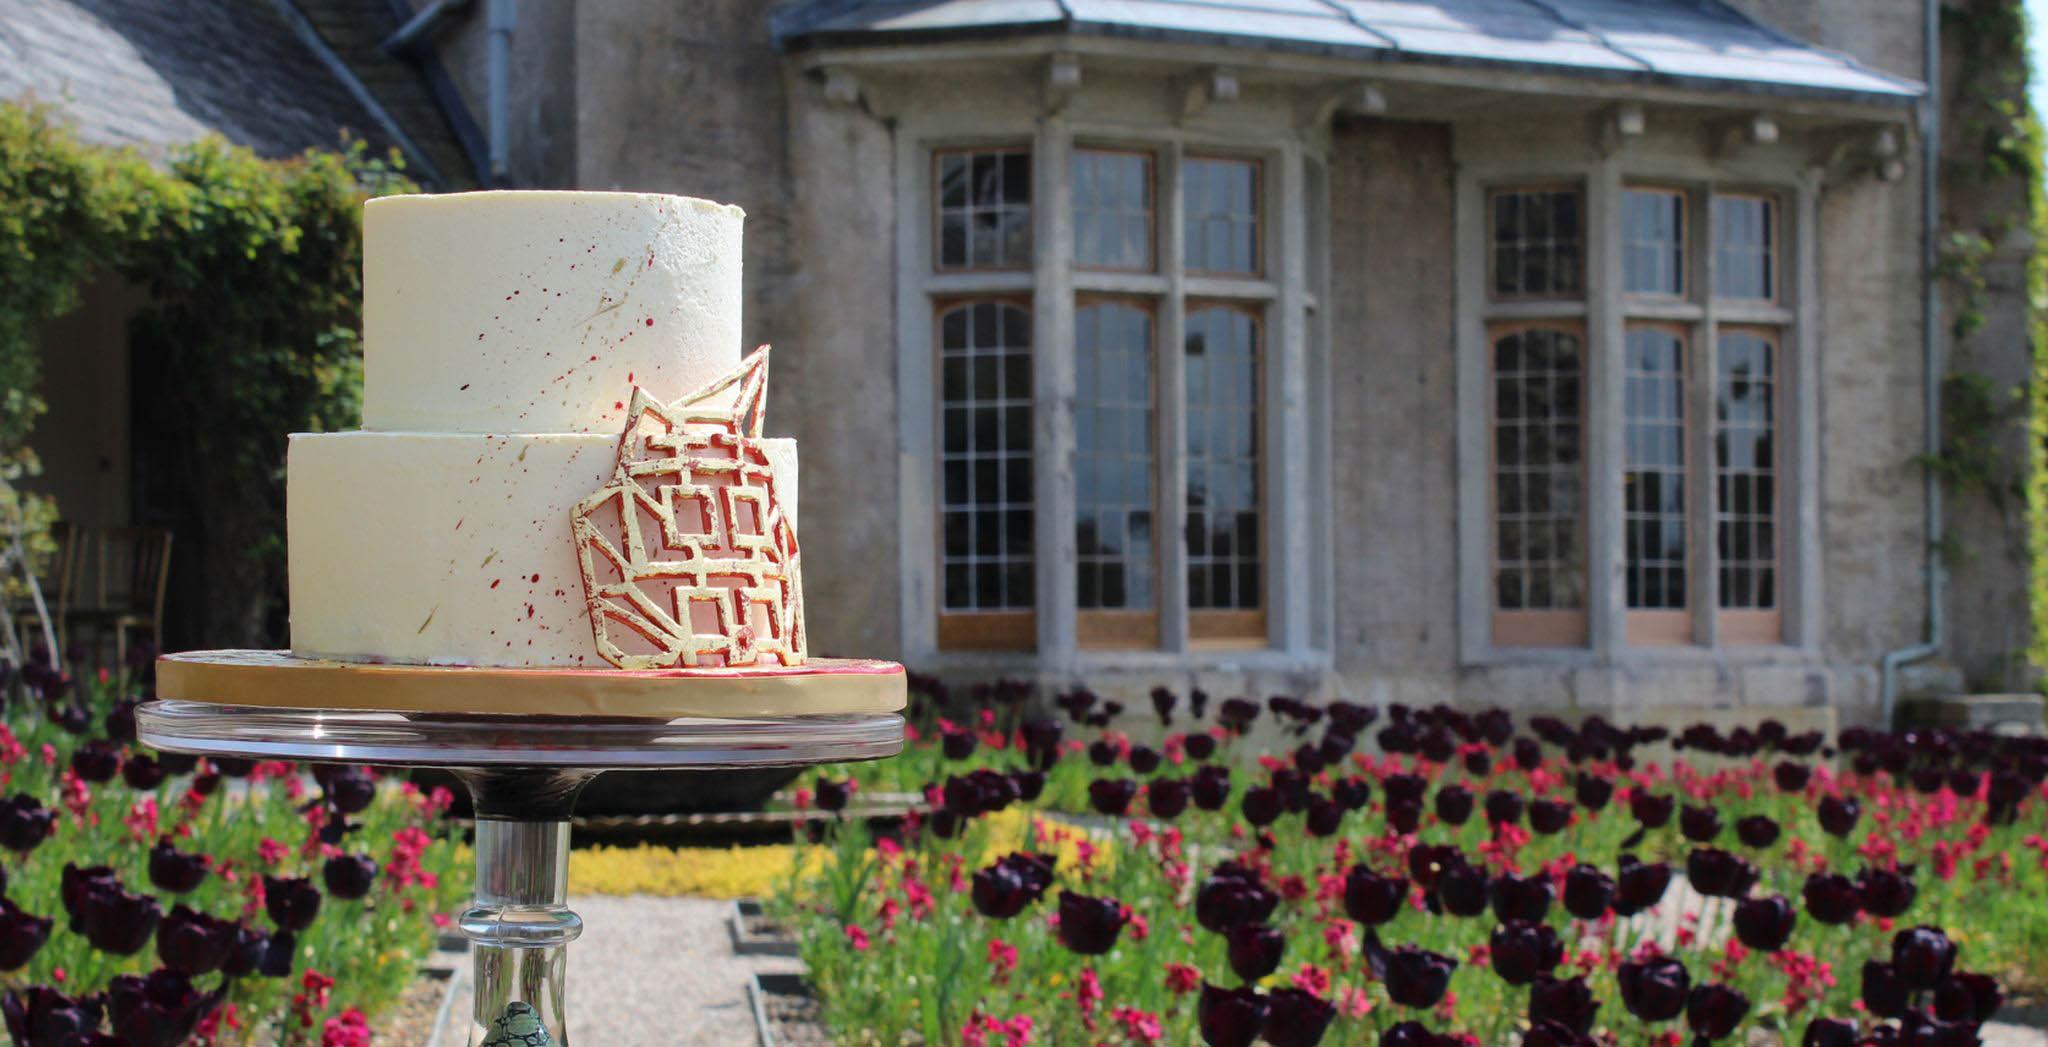 wedding cake, outside, garden